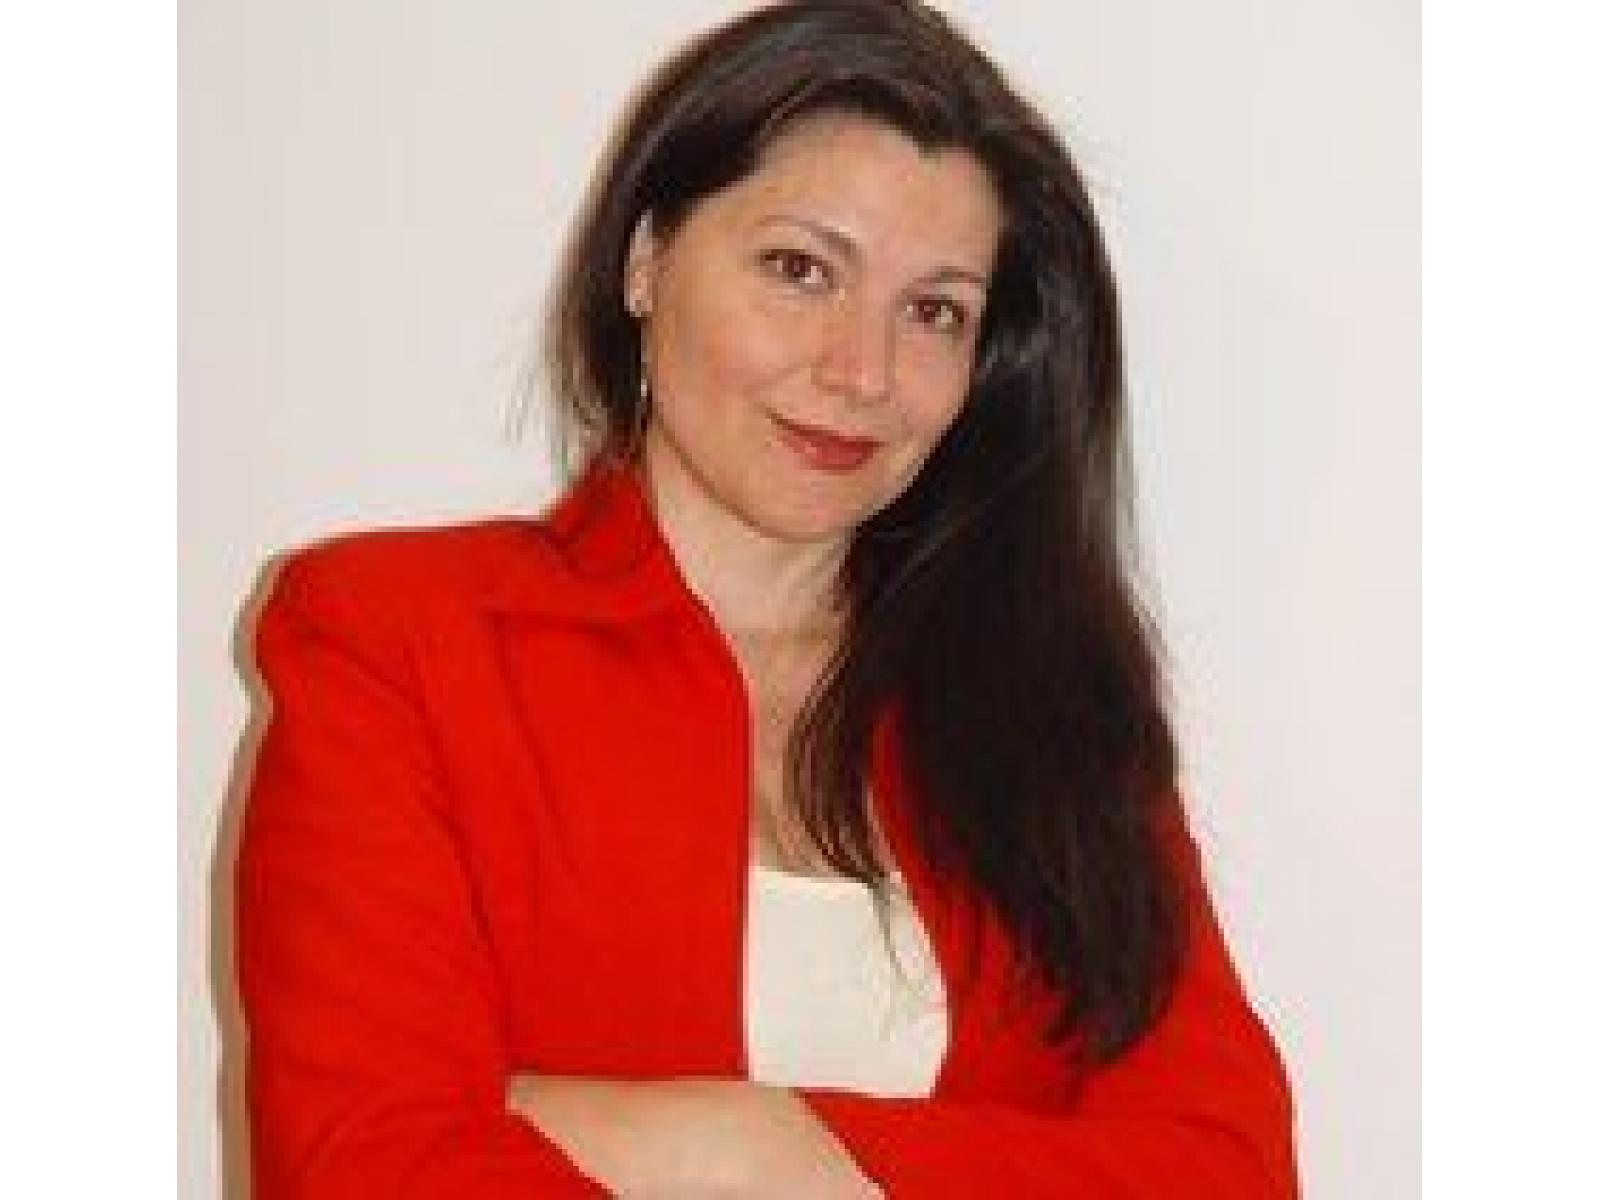 Cabinet PSIHOTERAPIE/CONSILIERE/SEXOLOGIE  Elena  Cozma - Elena-Cozma1.jpg